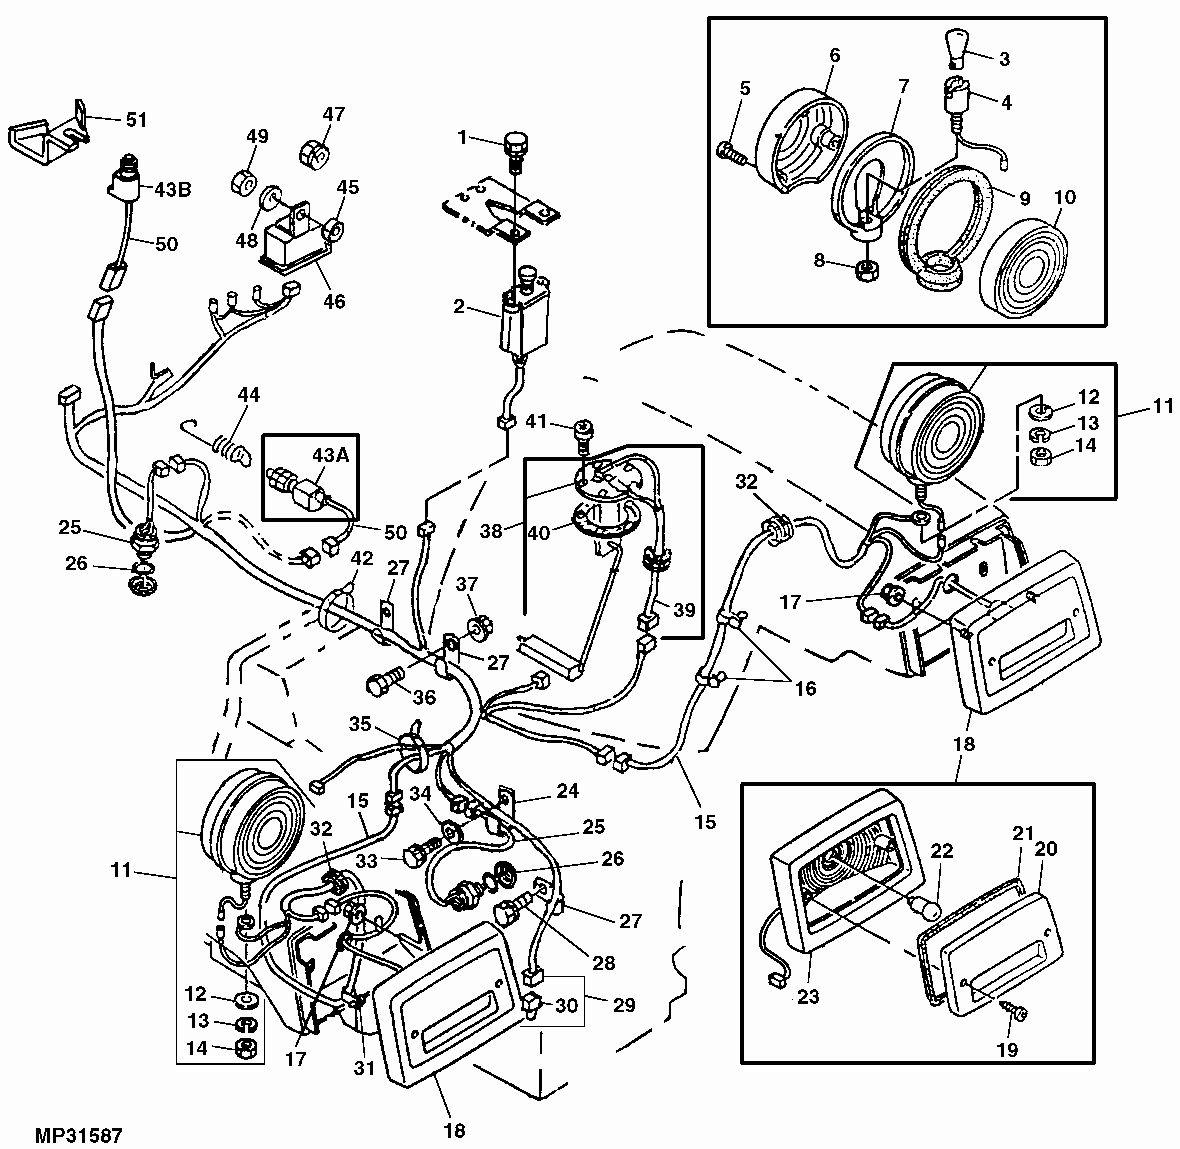 Wiring Diagrams 748 G John Deere